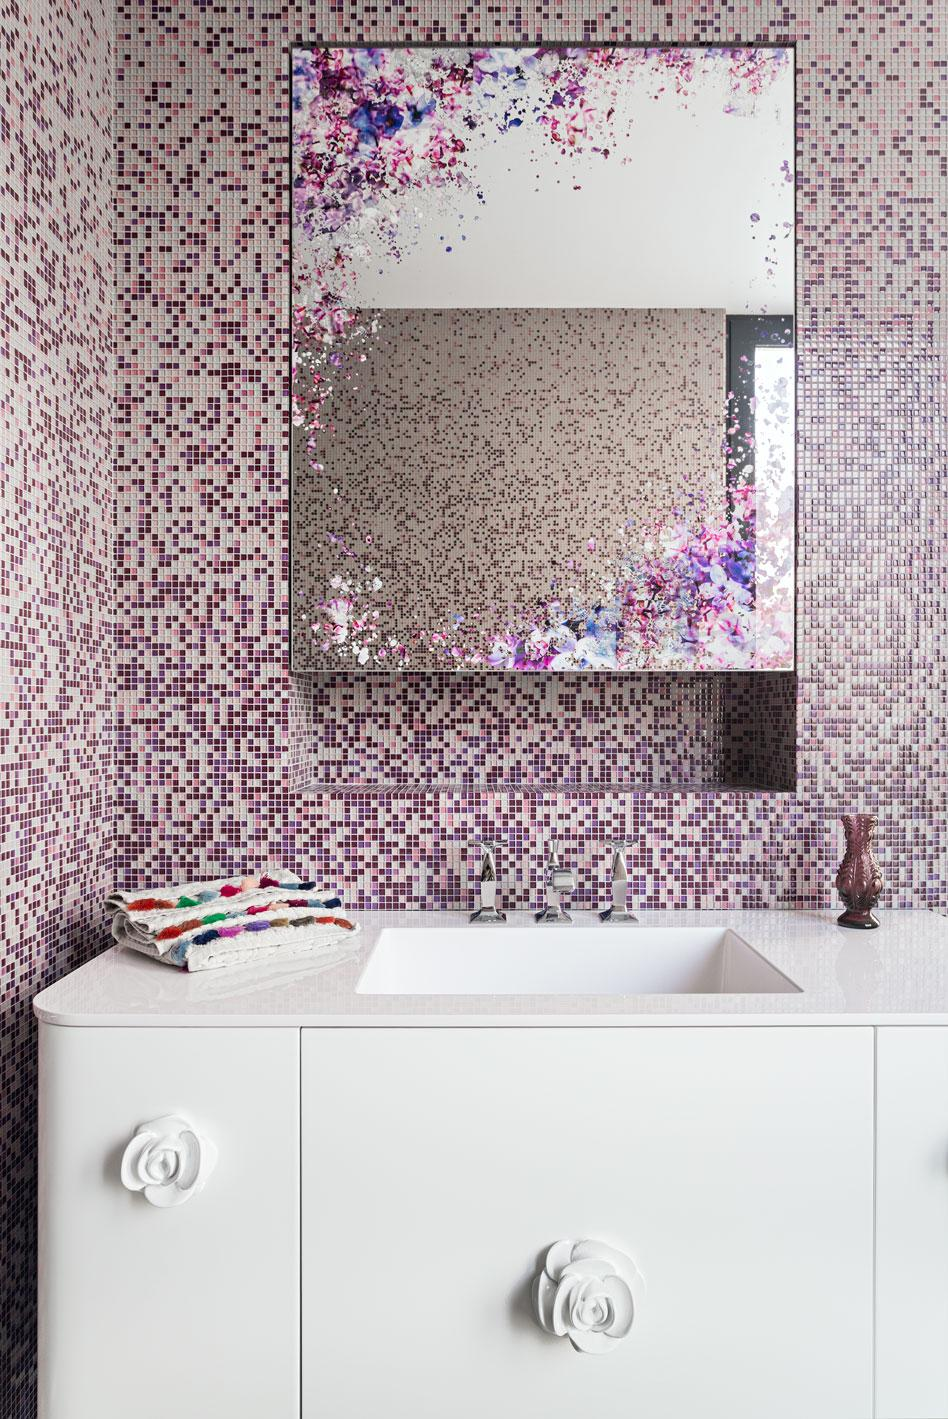 Purple mosaic in bathroom